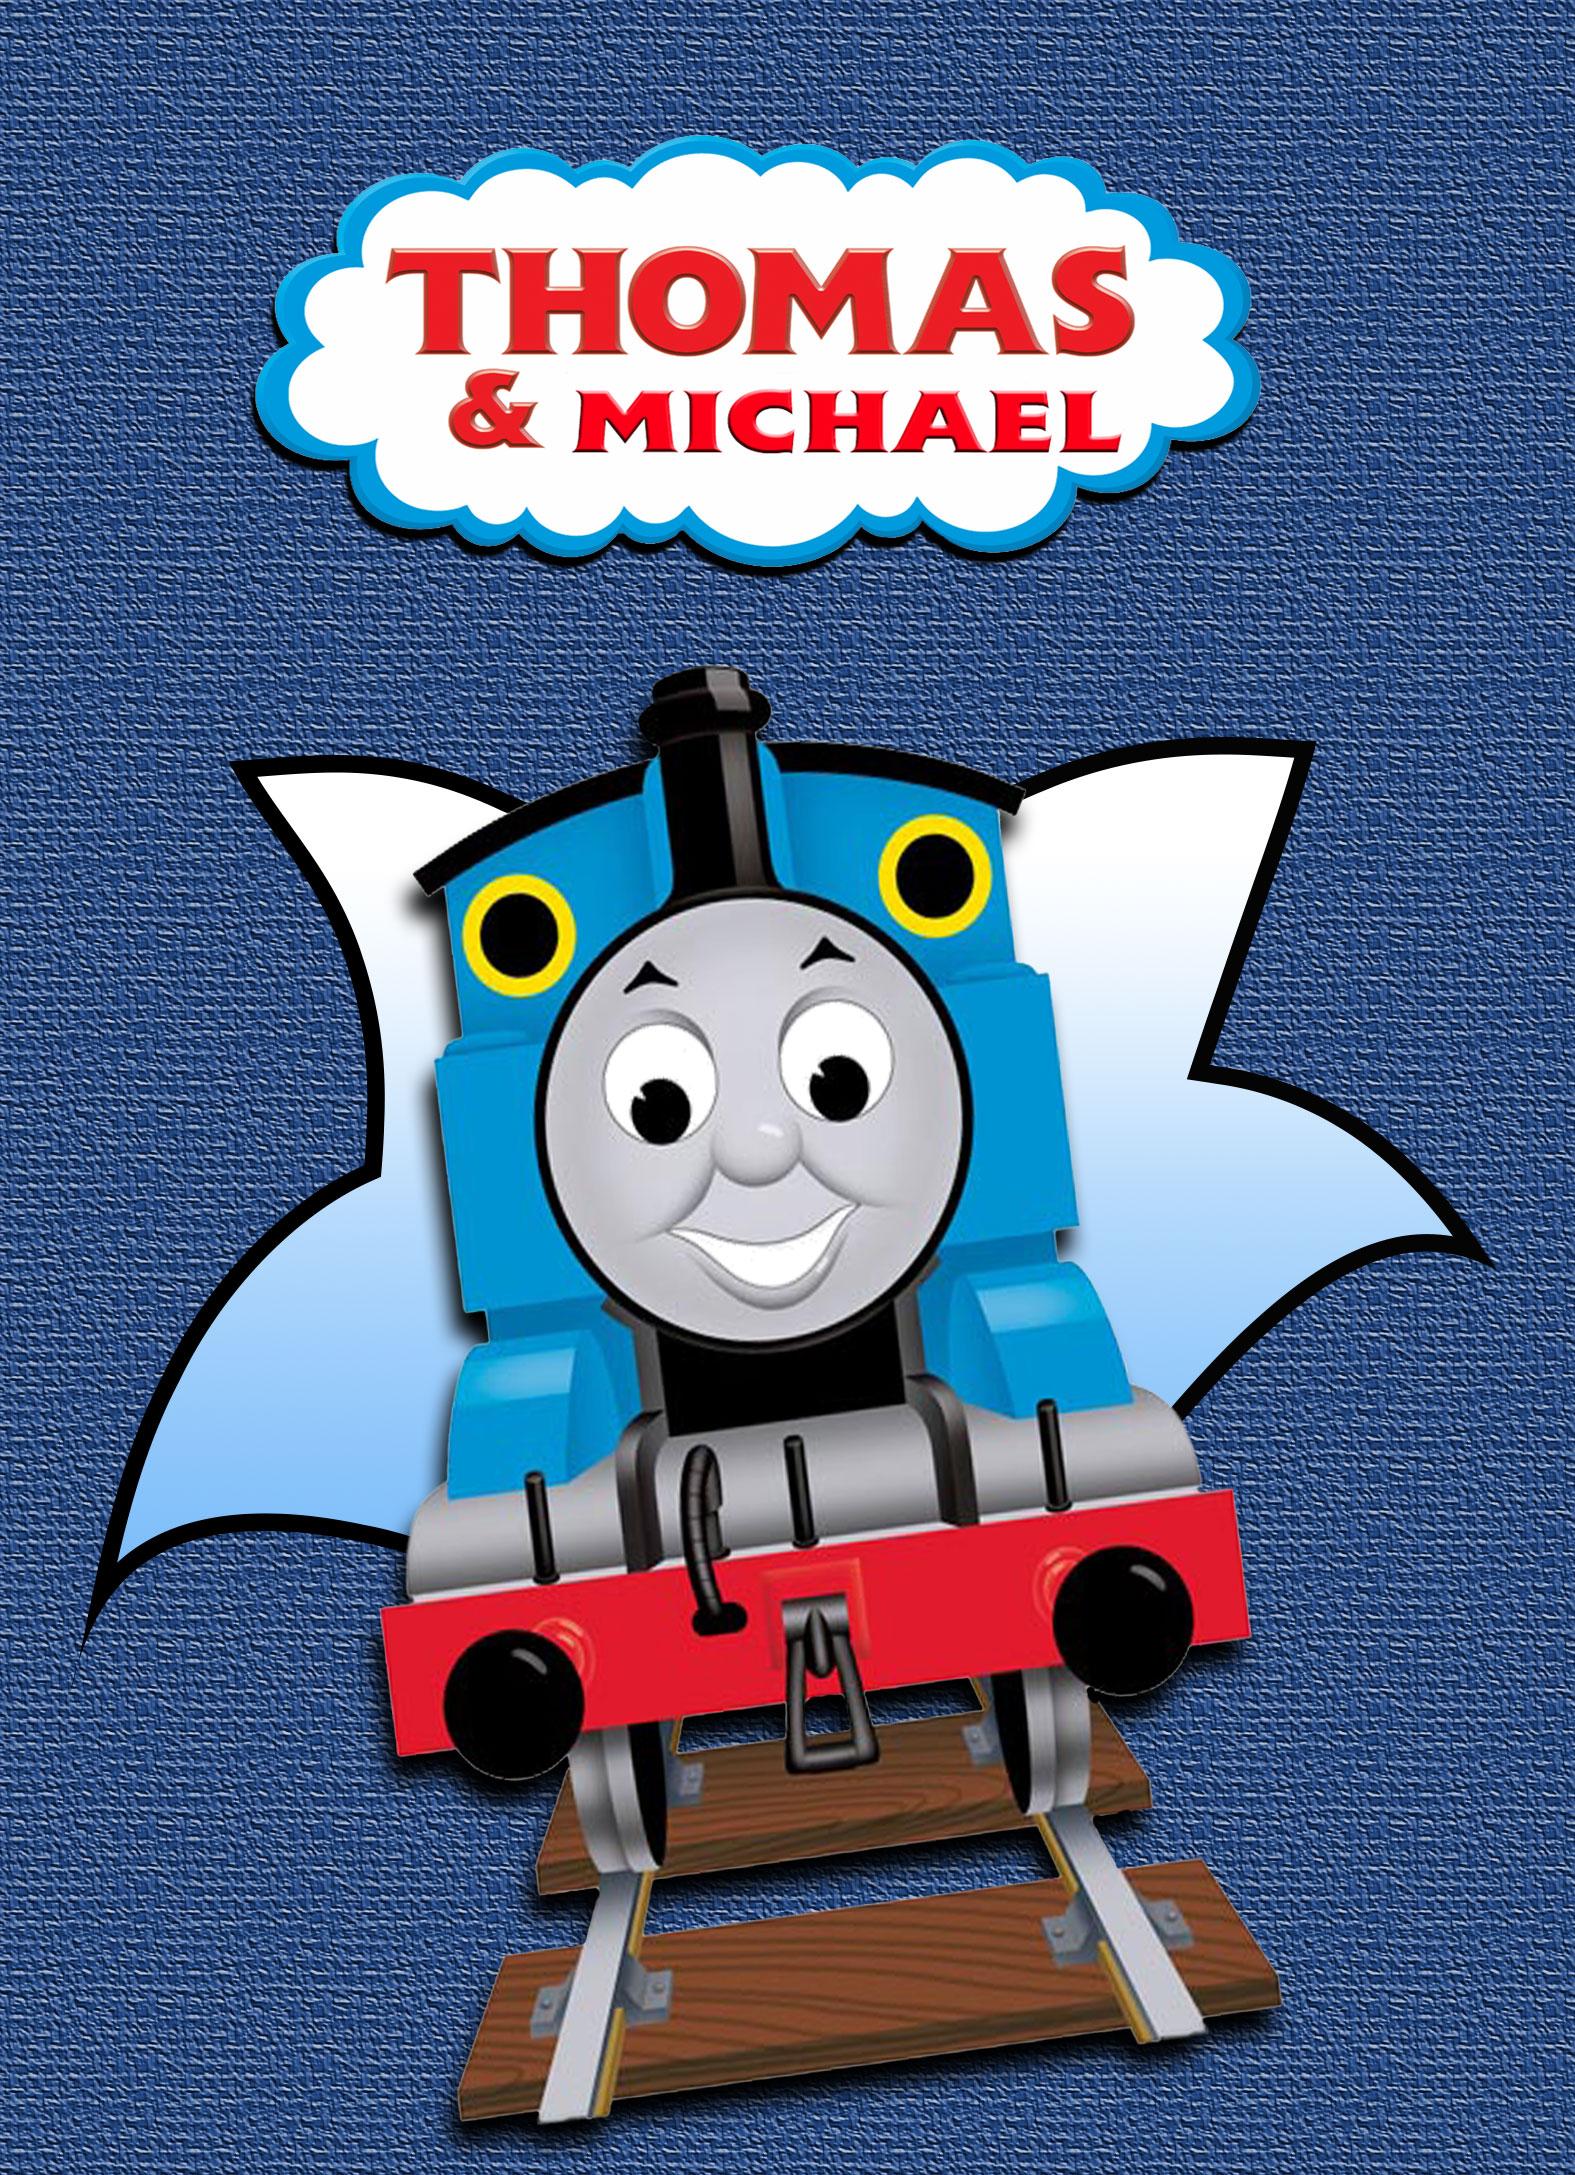 Thomas the Train Personalized Birthday Invitation 2 Sided, Birthday ...